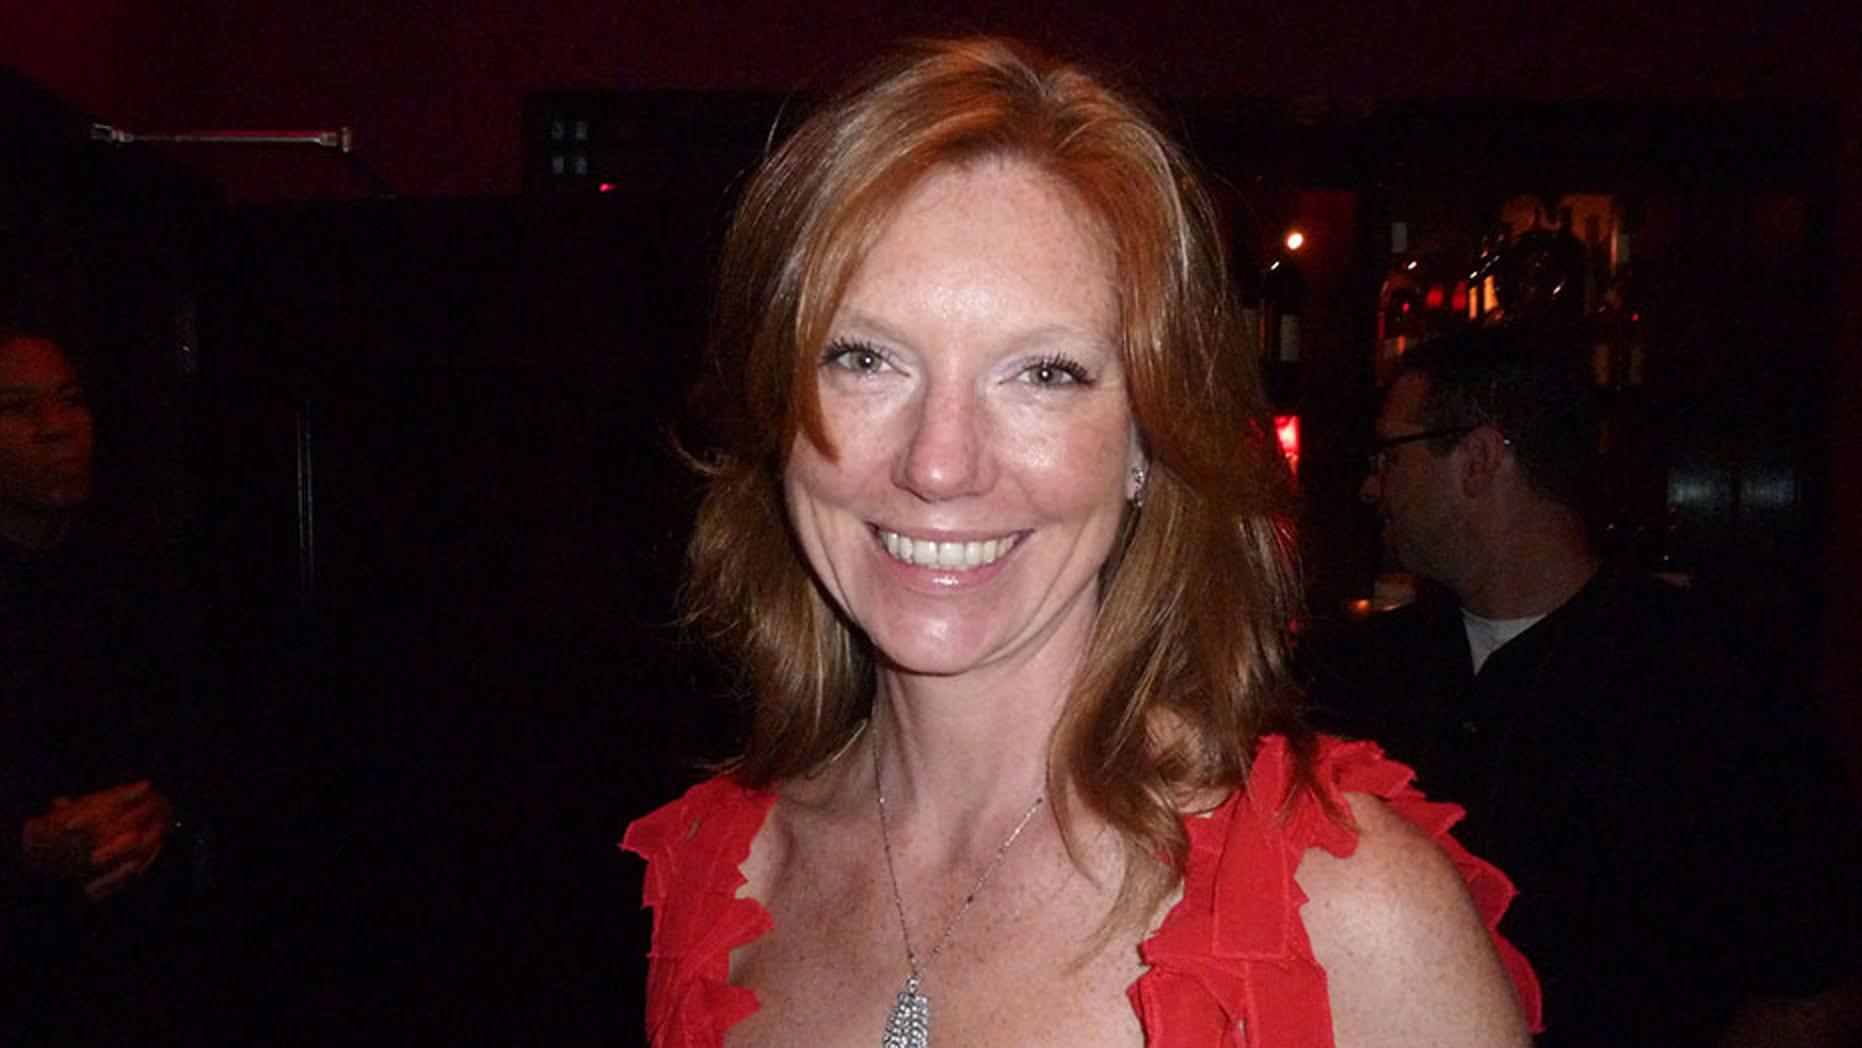 Lara Prychodko was found dead in a trash chute outside a posh New York City apartment building.